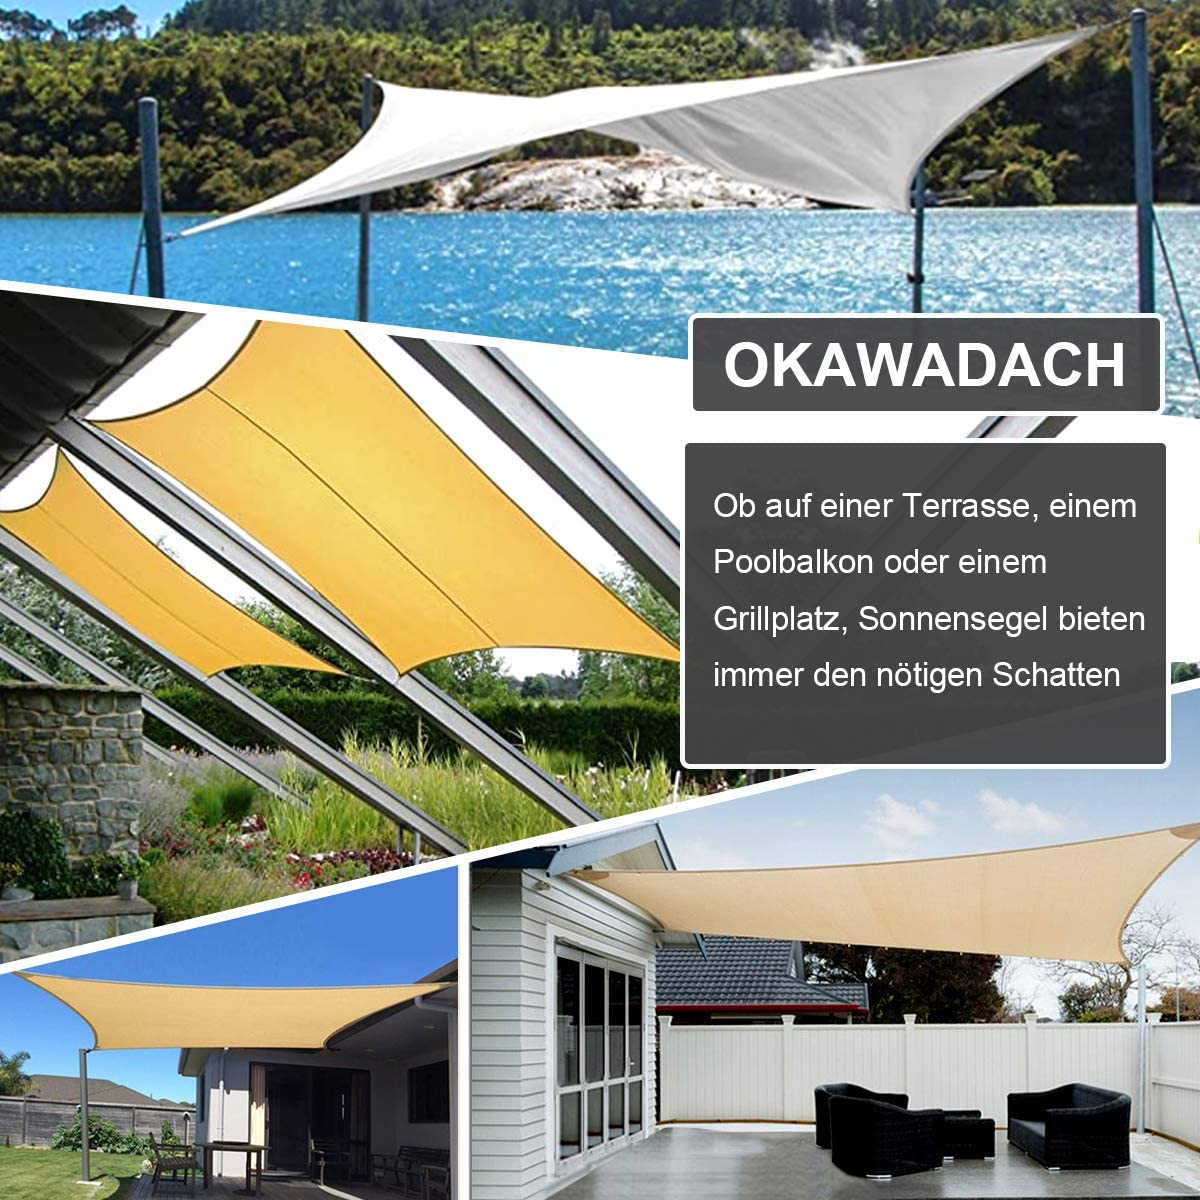 OKAWADACH Toldo Vela de Sombra Rectangular 2 x 4m, protección Rayos UV Impermeable para Patio, Exteriores, Jardín, Color Naranja